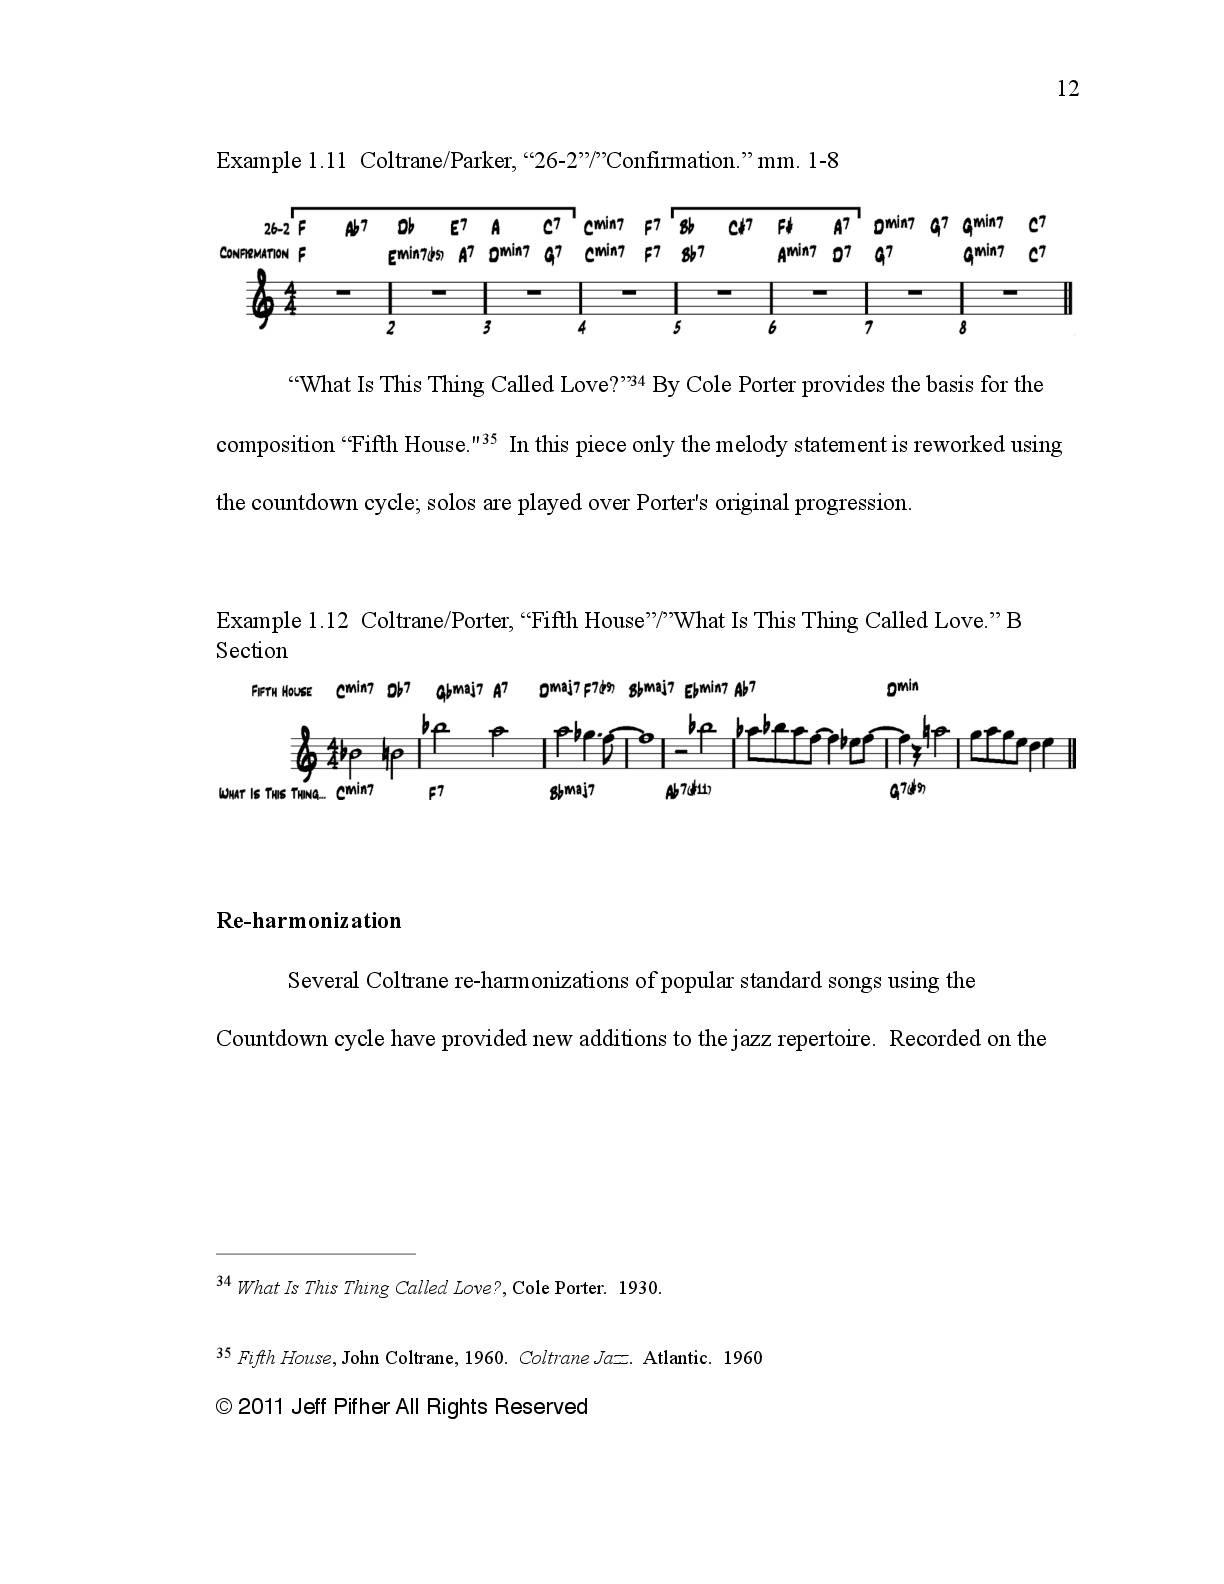 Jeff-Pifher-Academic-Series-Coltrane-Cycles-012.jpg